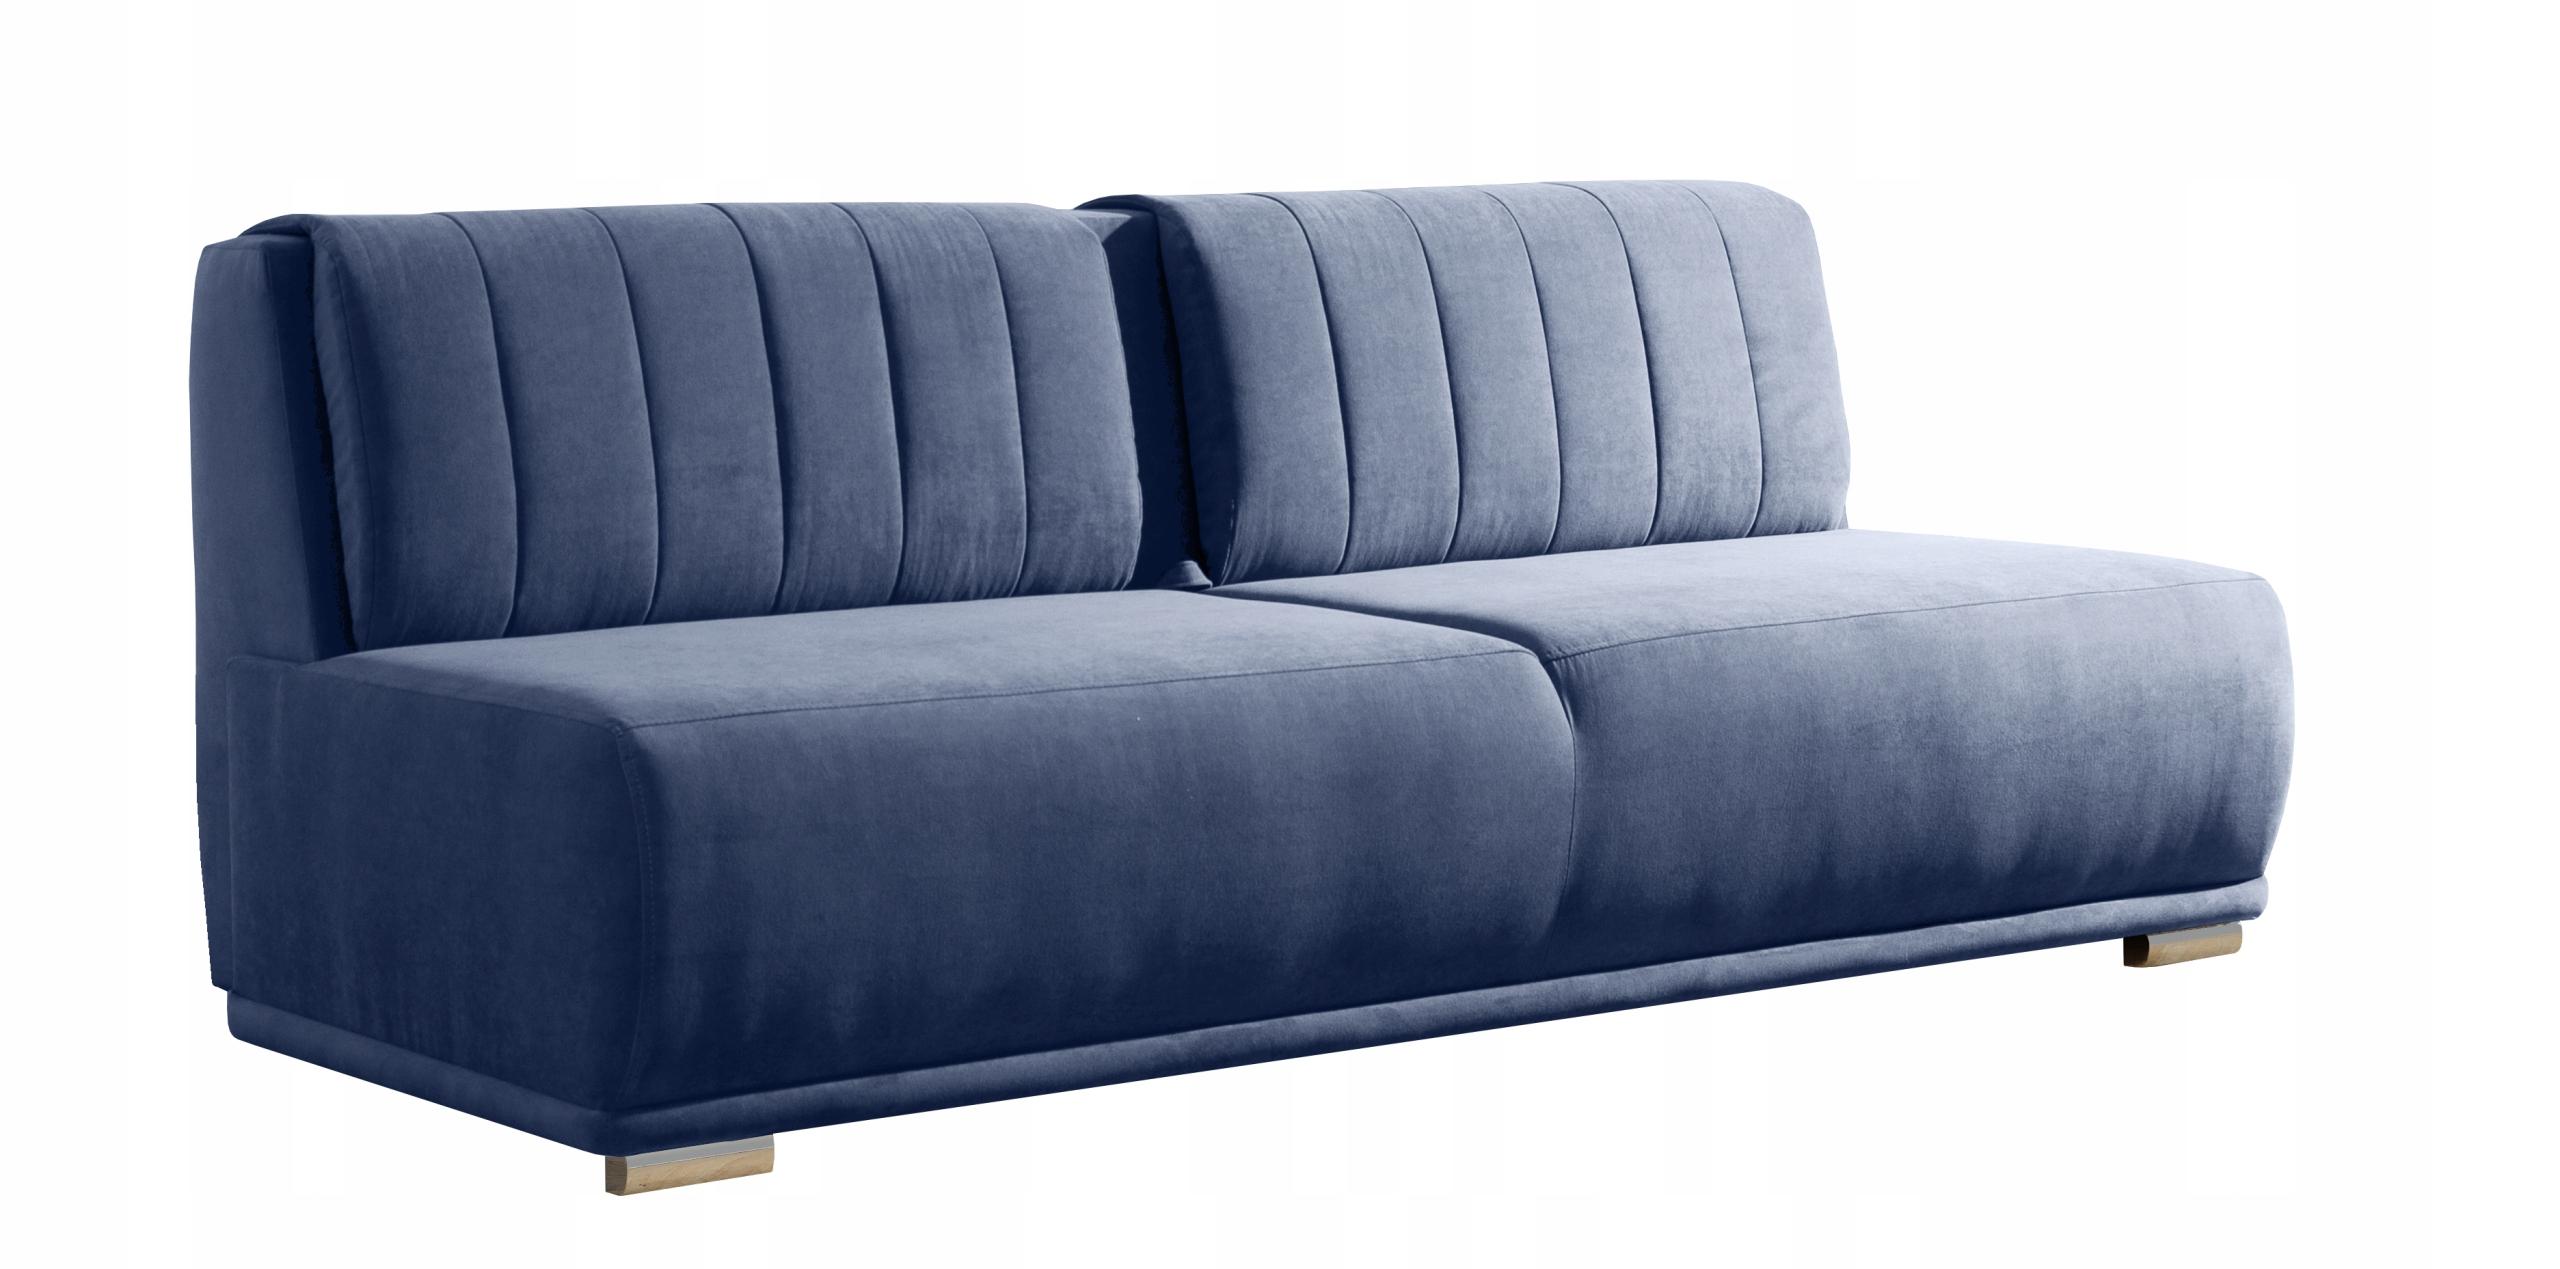 MERINDA Avantgarde-Sofa - Sofamaschine DL Collection ELN59